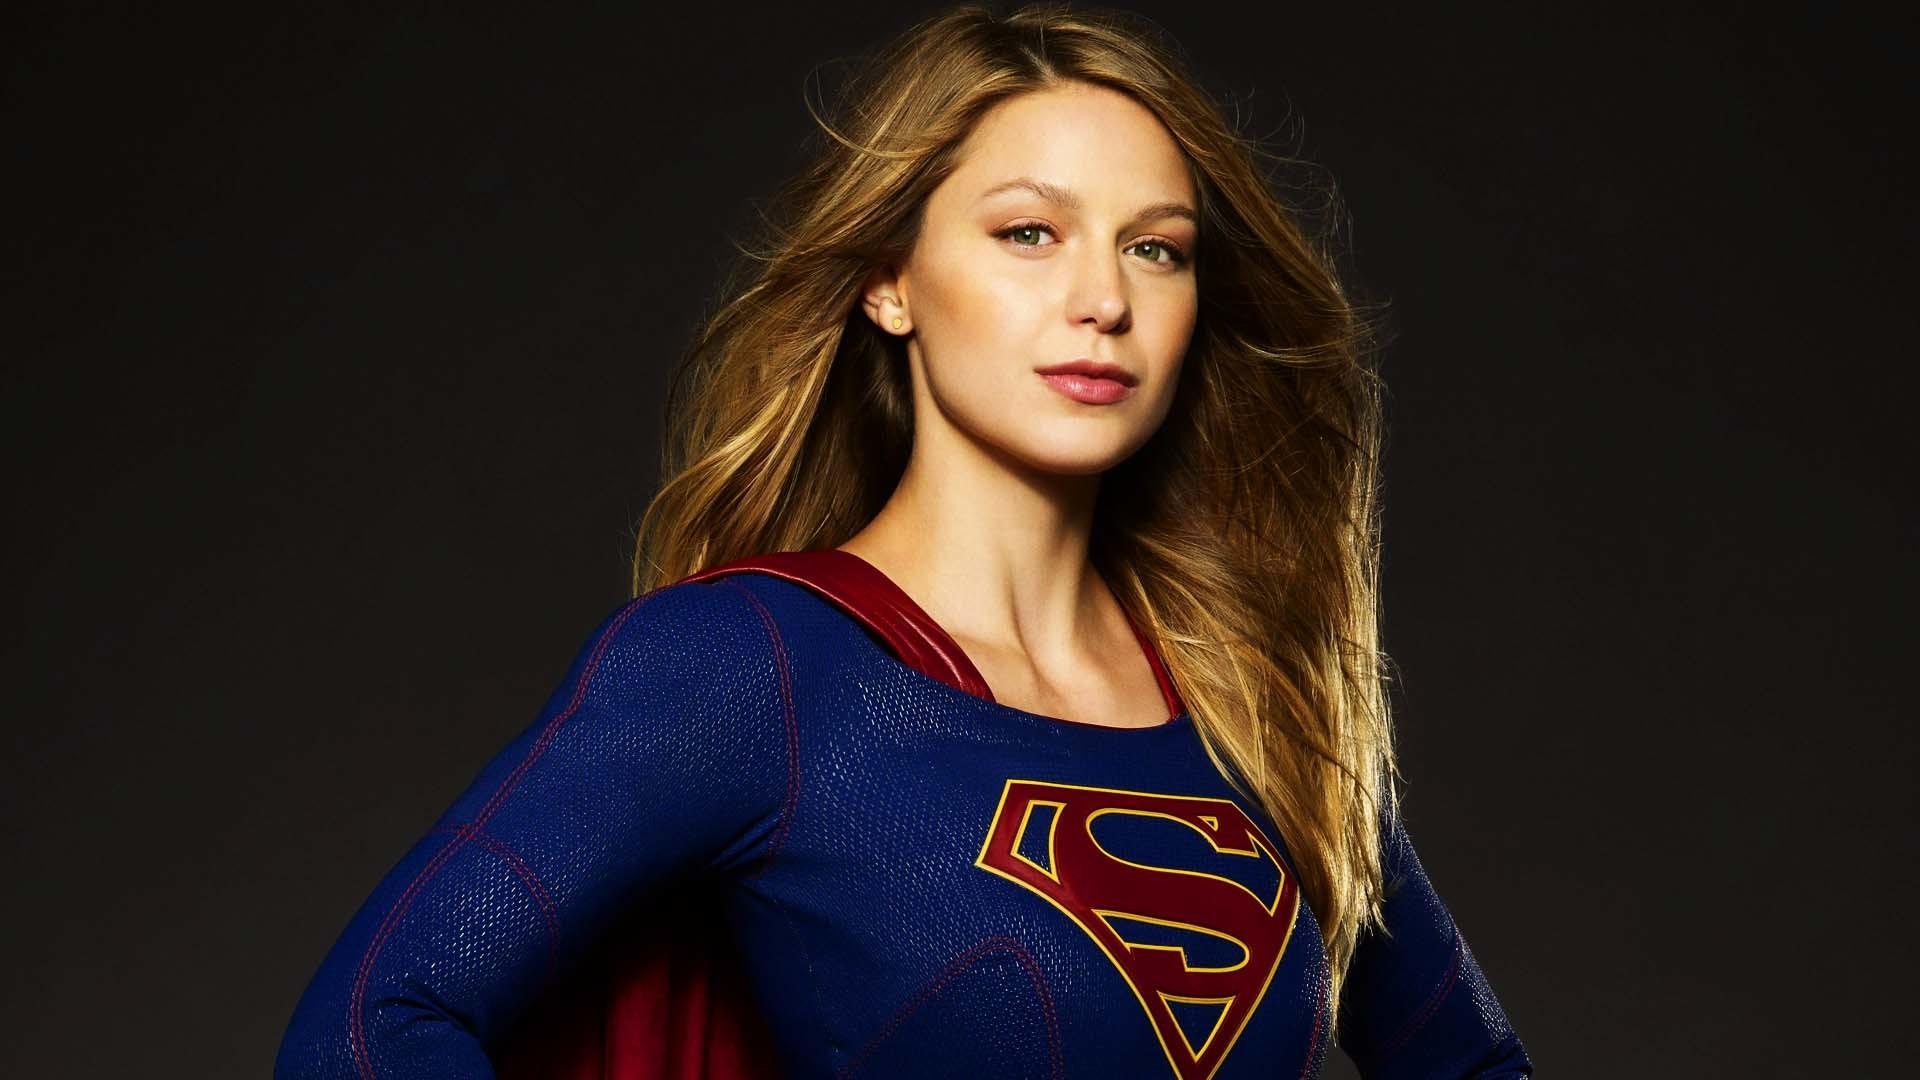 Fondos Serie Supergirl Wallpapers Gratis